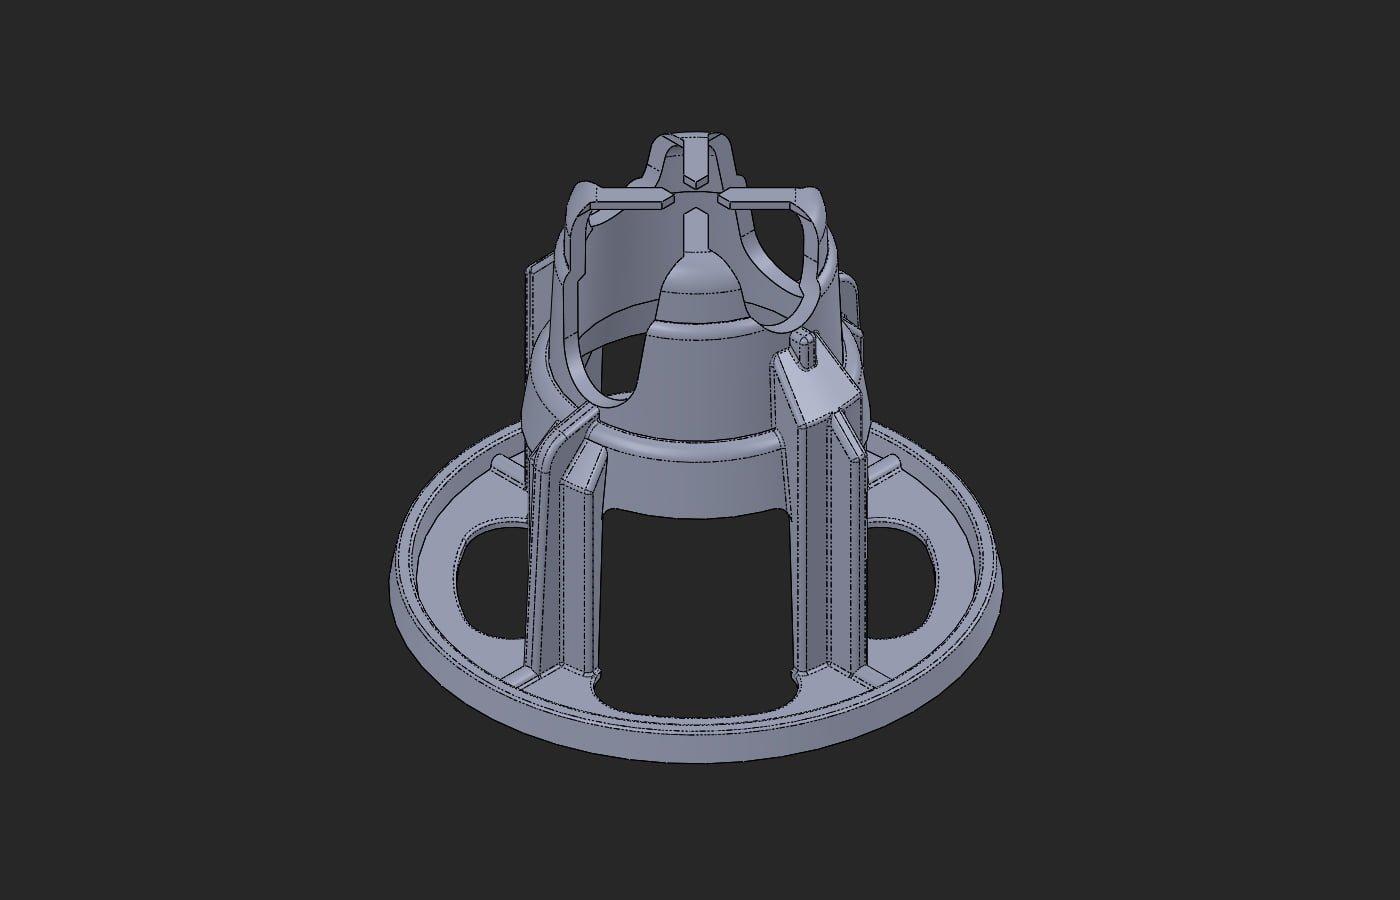 Product Design 2